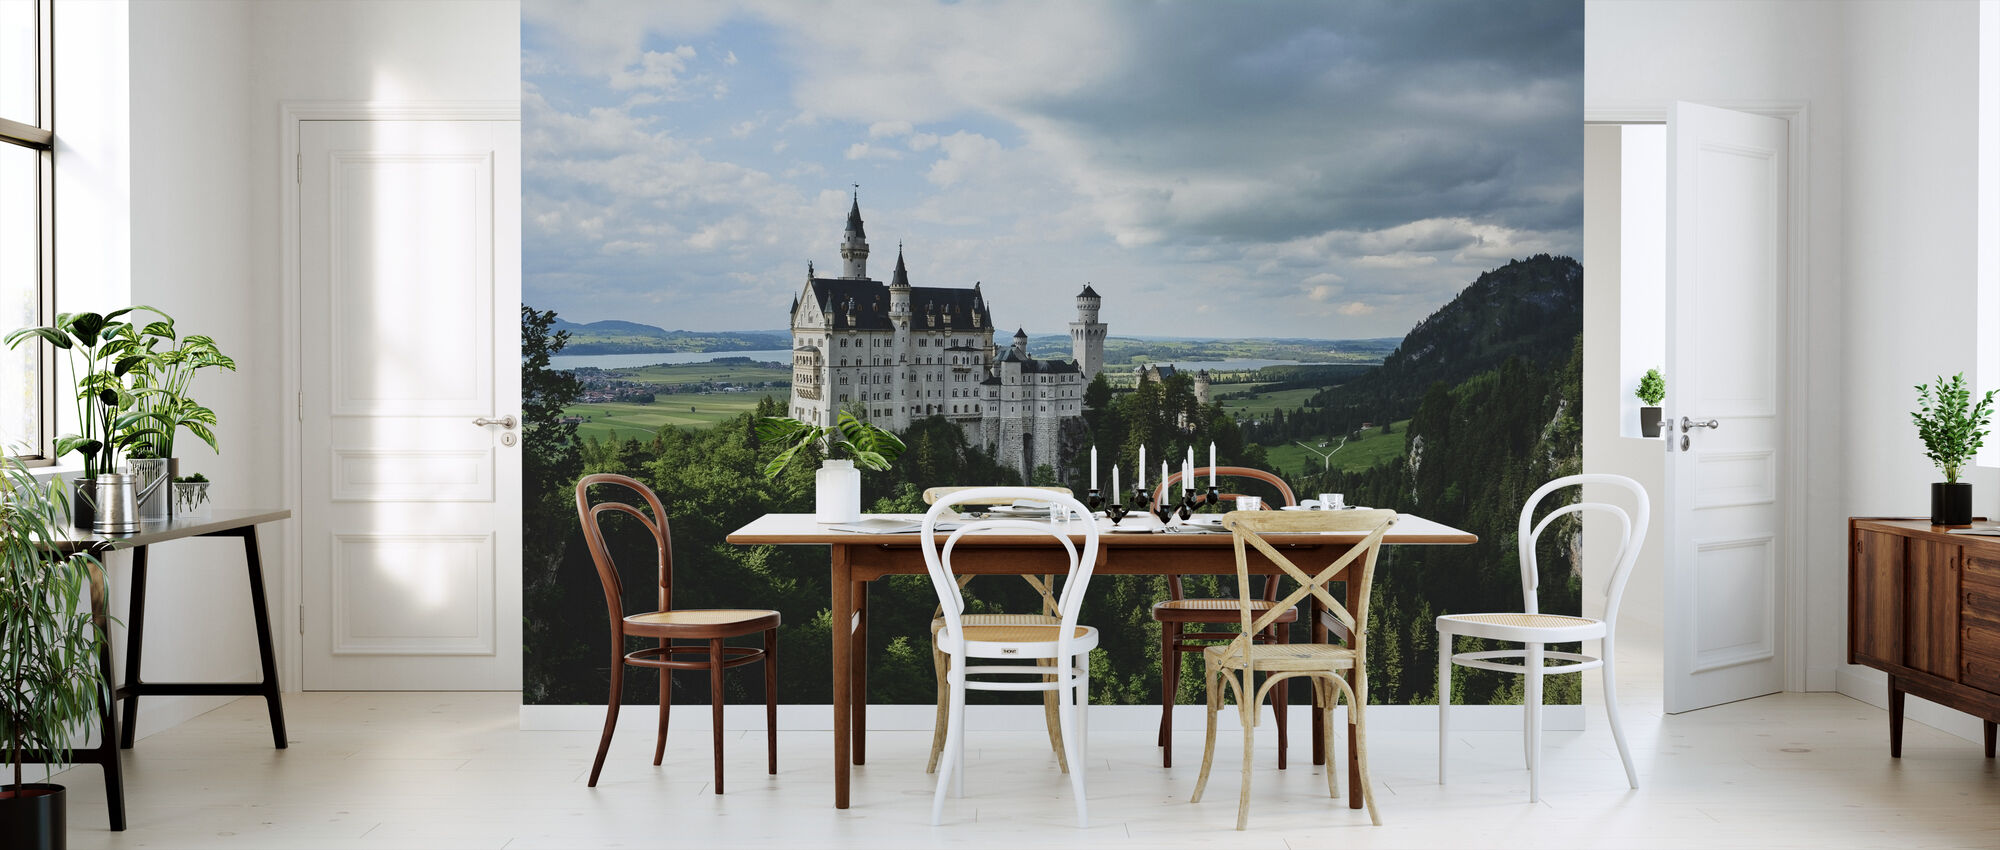 neuschwanstein castle fototapete nach ma photowall. Black Bedroom Furniture Sets. Home Design Ideas